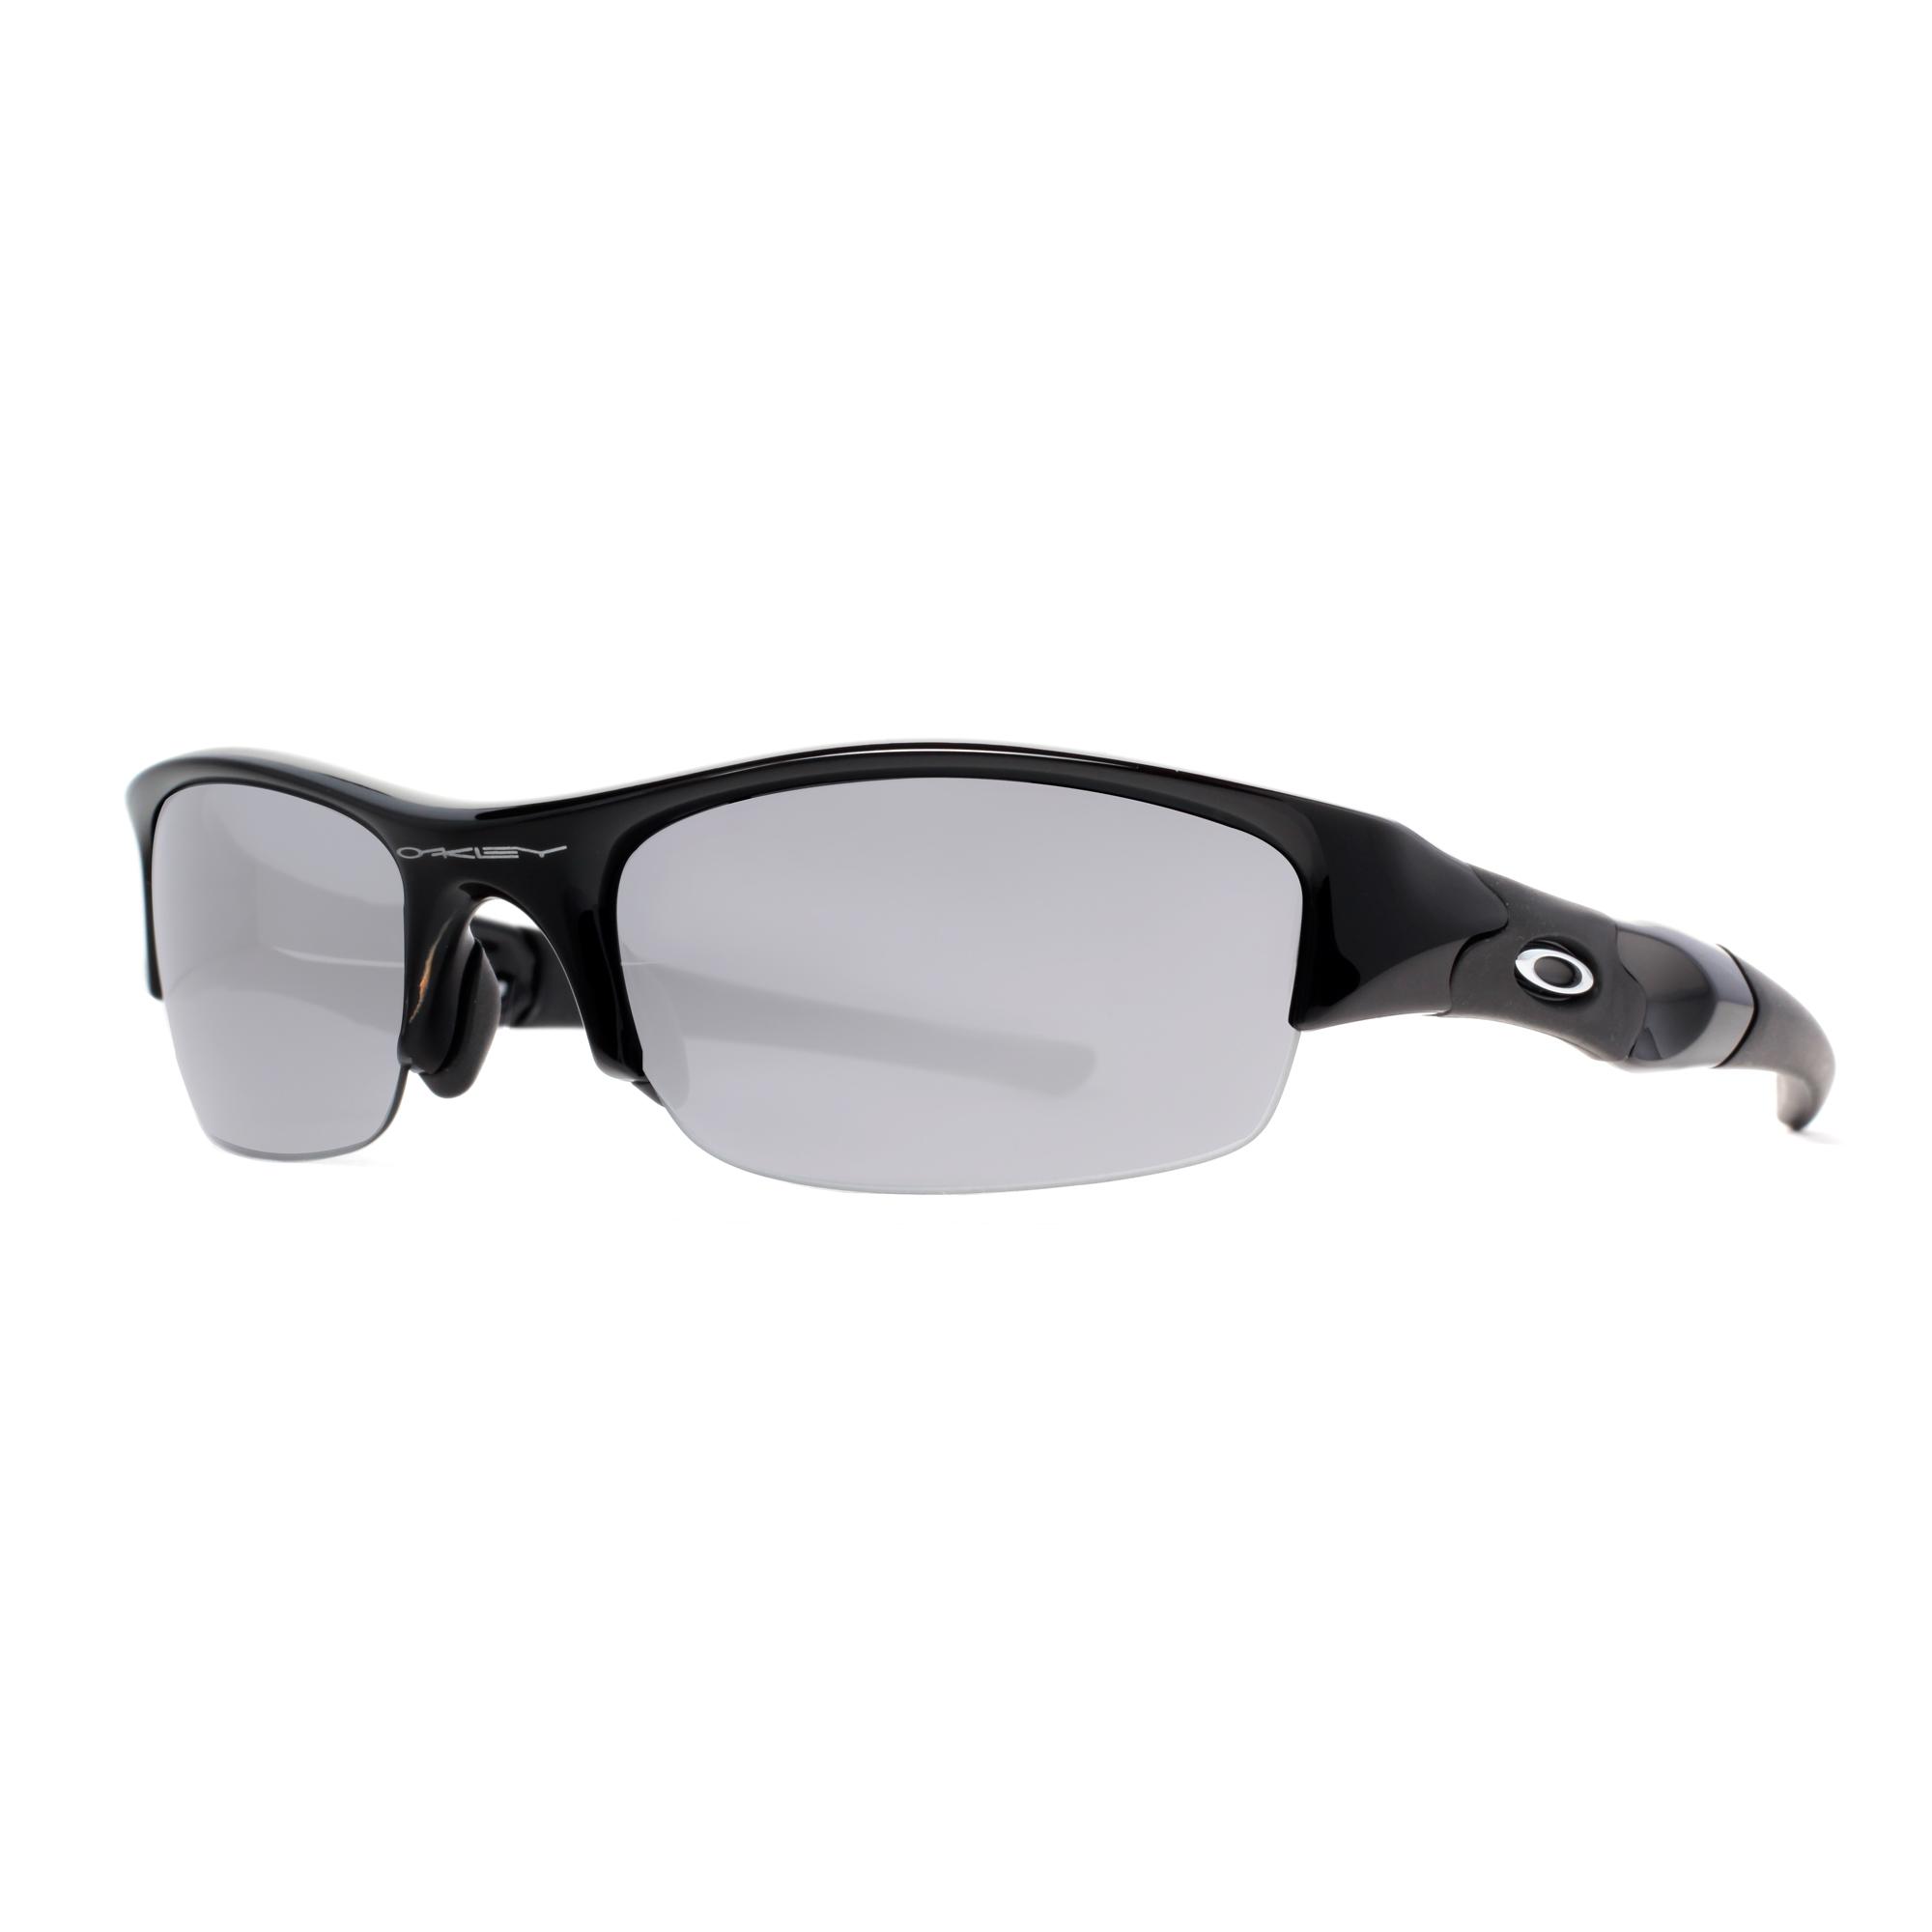 06bd273b79d Oakley Sport Sunglasses Ebay « Heritage Malta